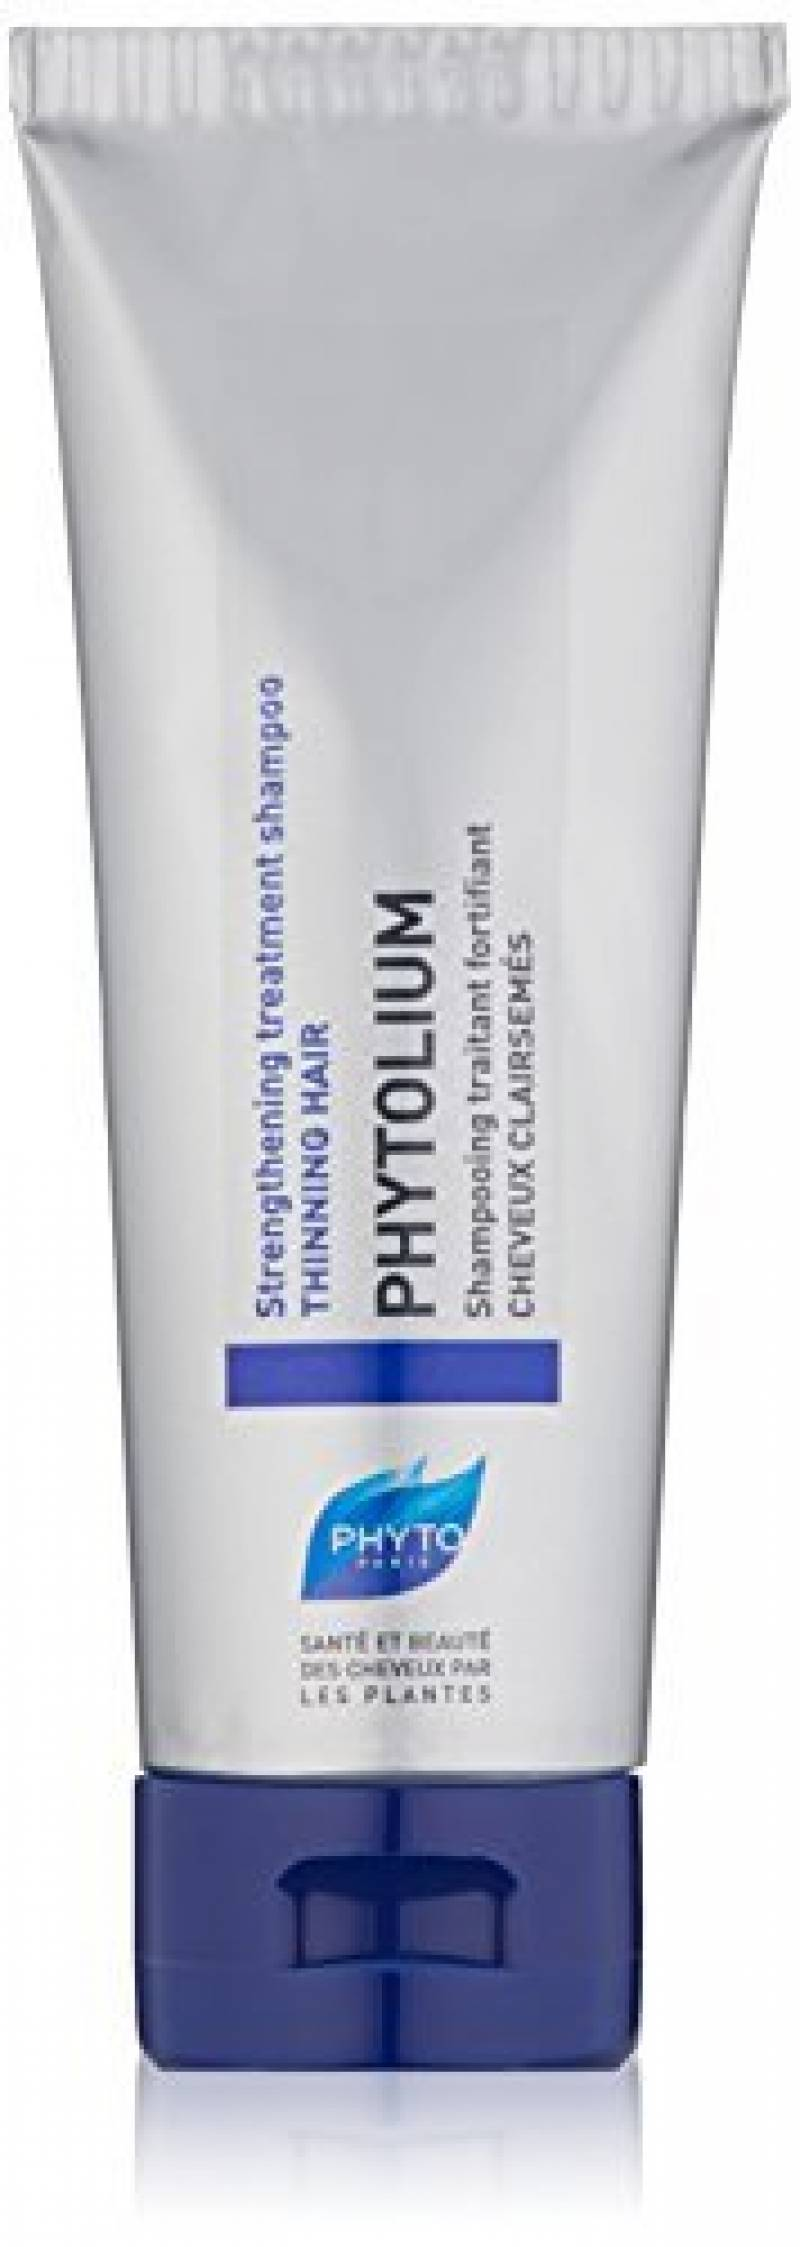 Phyto Phytolium Shampooing Traitant Fortifiant 125 ml de la marque Phyto TOP 7 image 0 produit